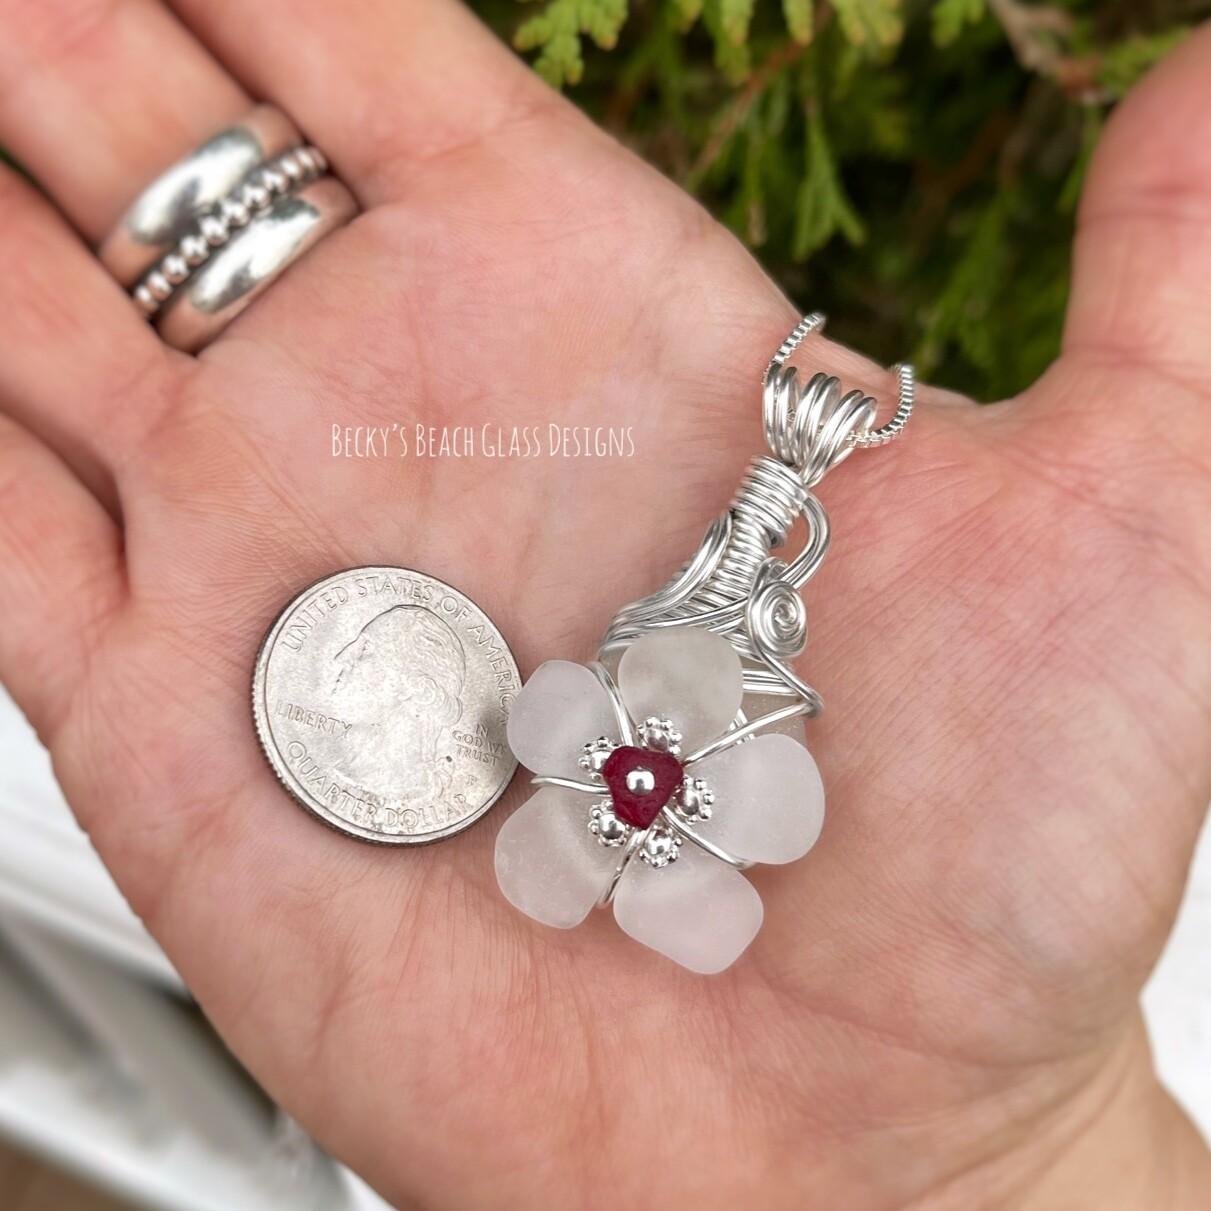 Petite White w/Red Center Sea Glass Flower Pendant Necklace